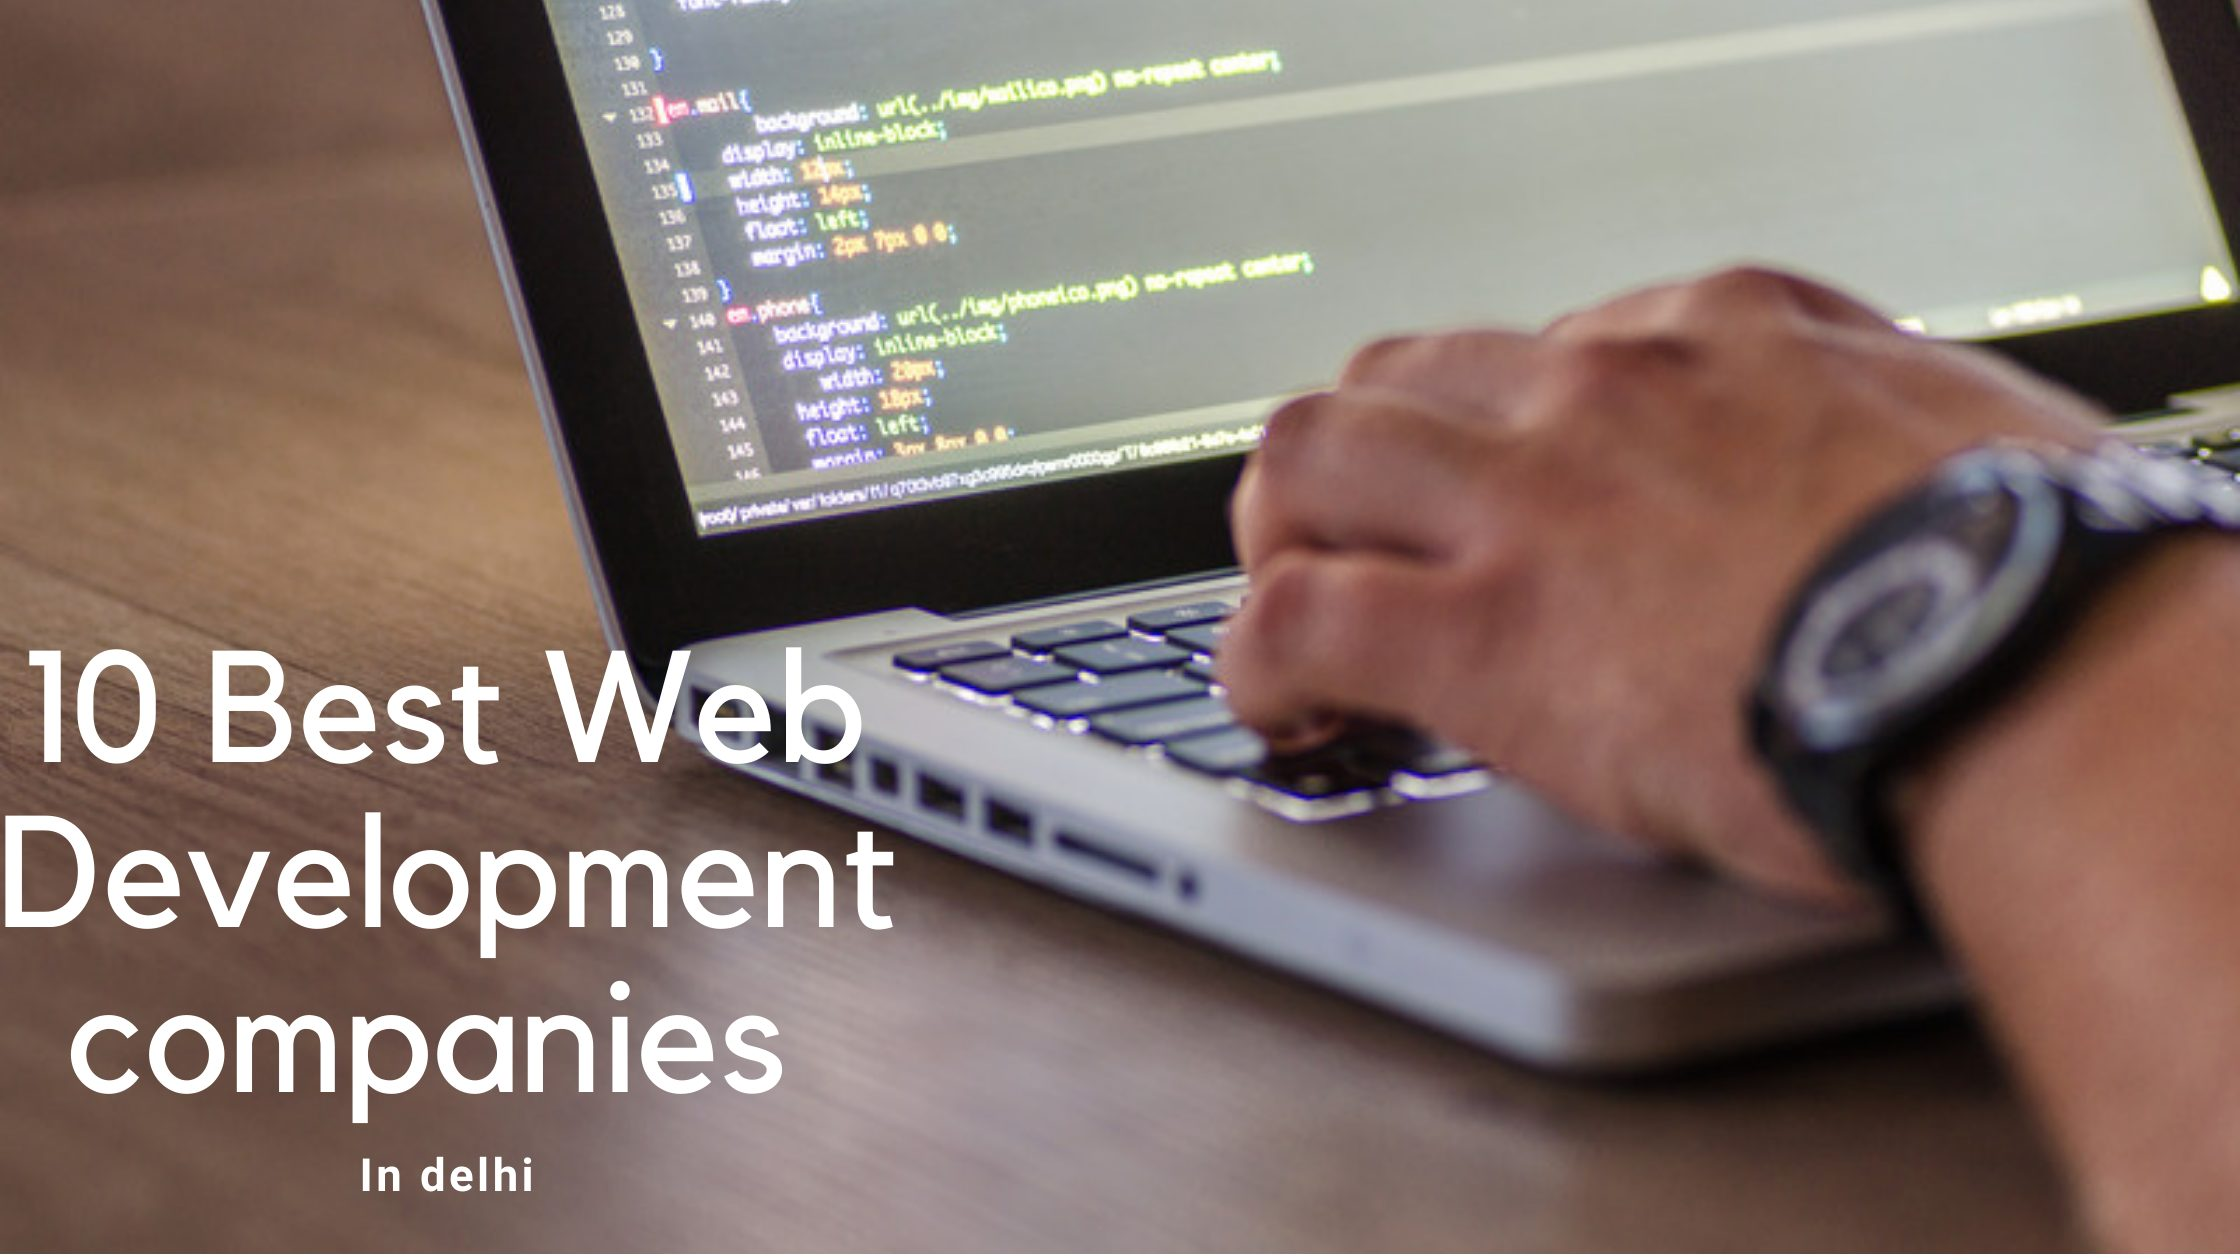 10 best web development companies in delhi